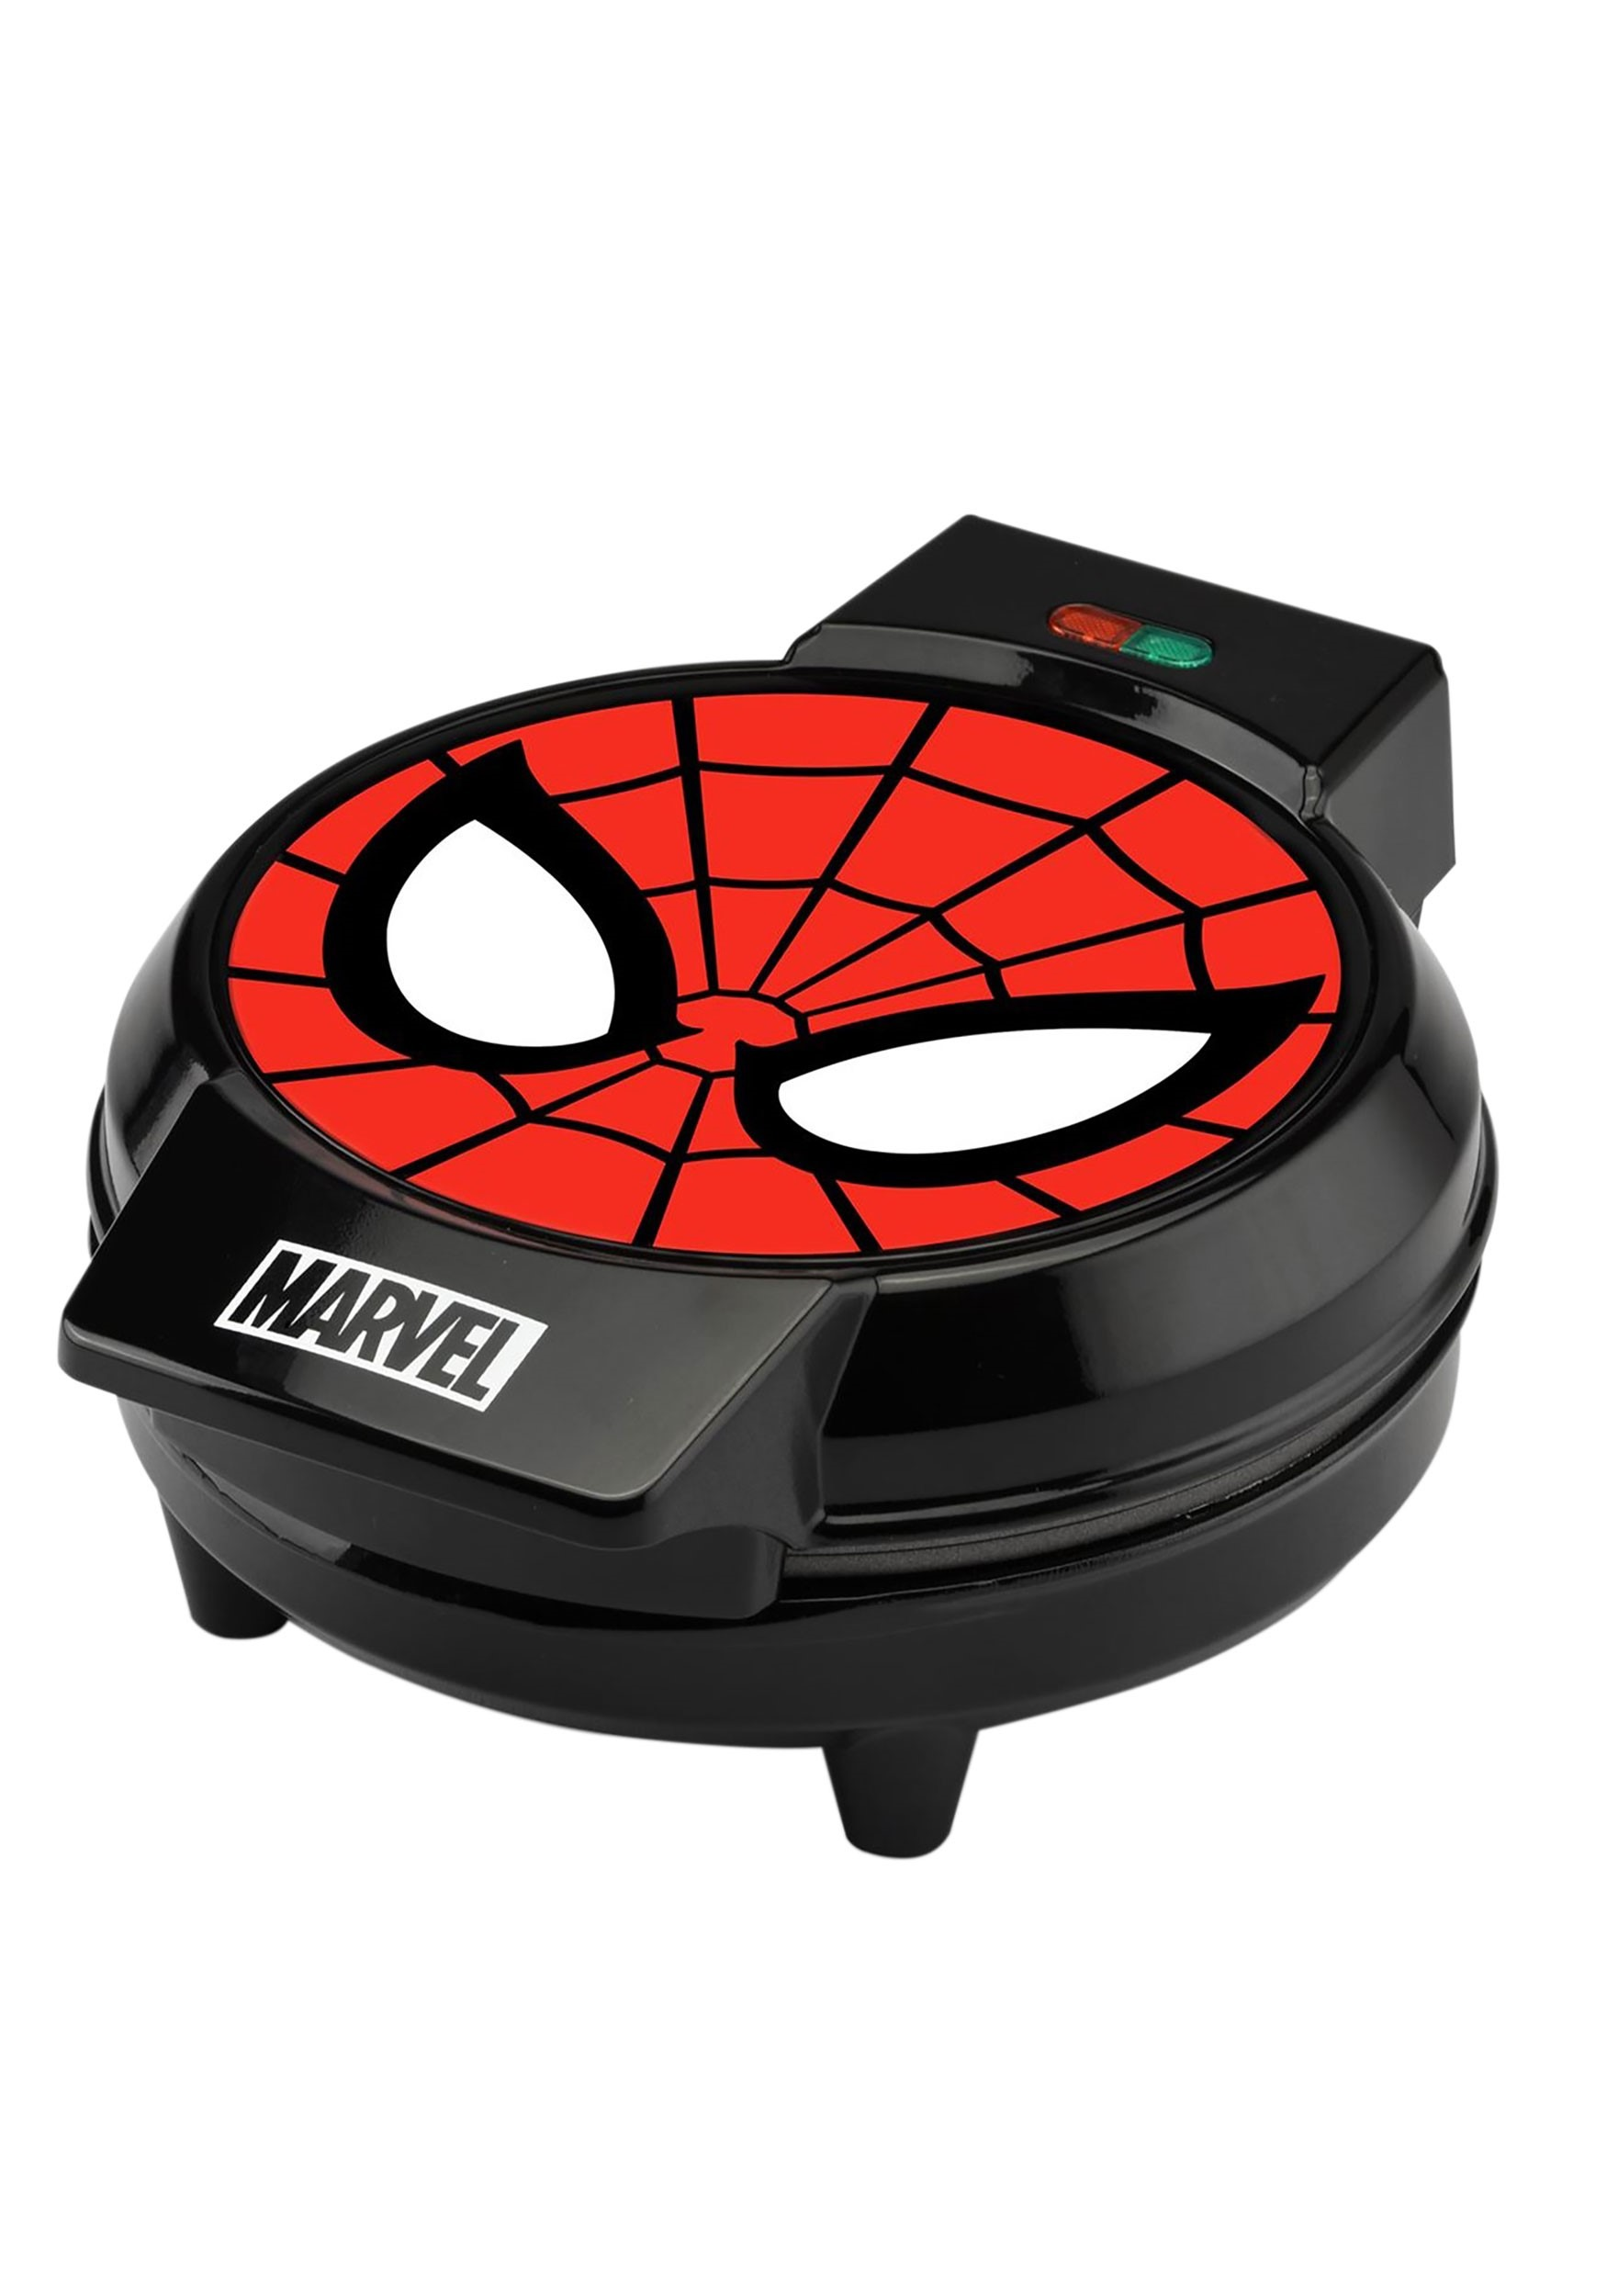 Spider-Man Comic Round Waffle Maker Appliance